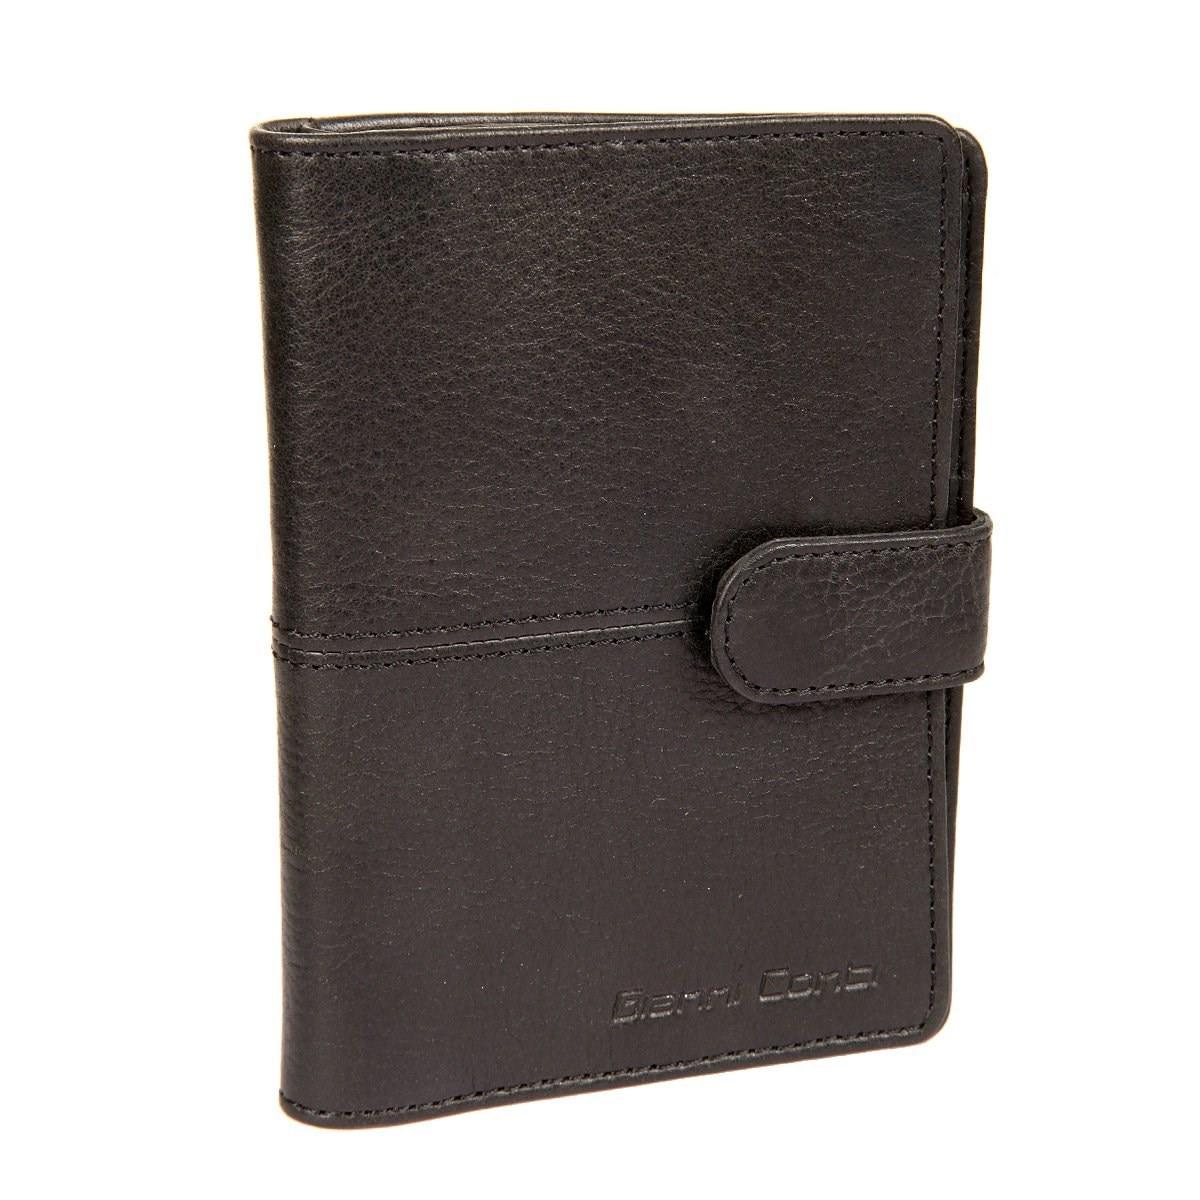 Passport cover and avtodokumentov Gianni Conti 1137458 black 1more super bass headphones black and red